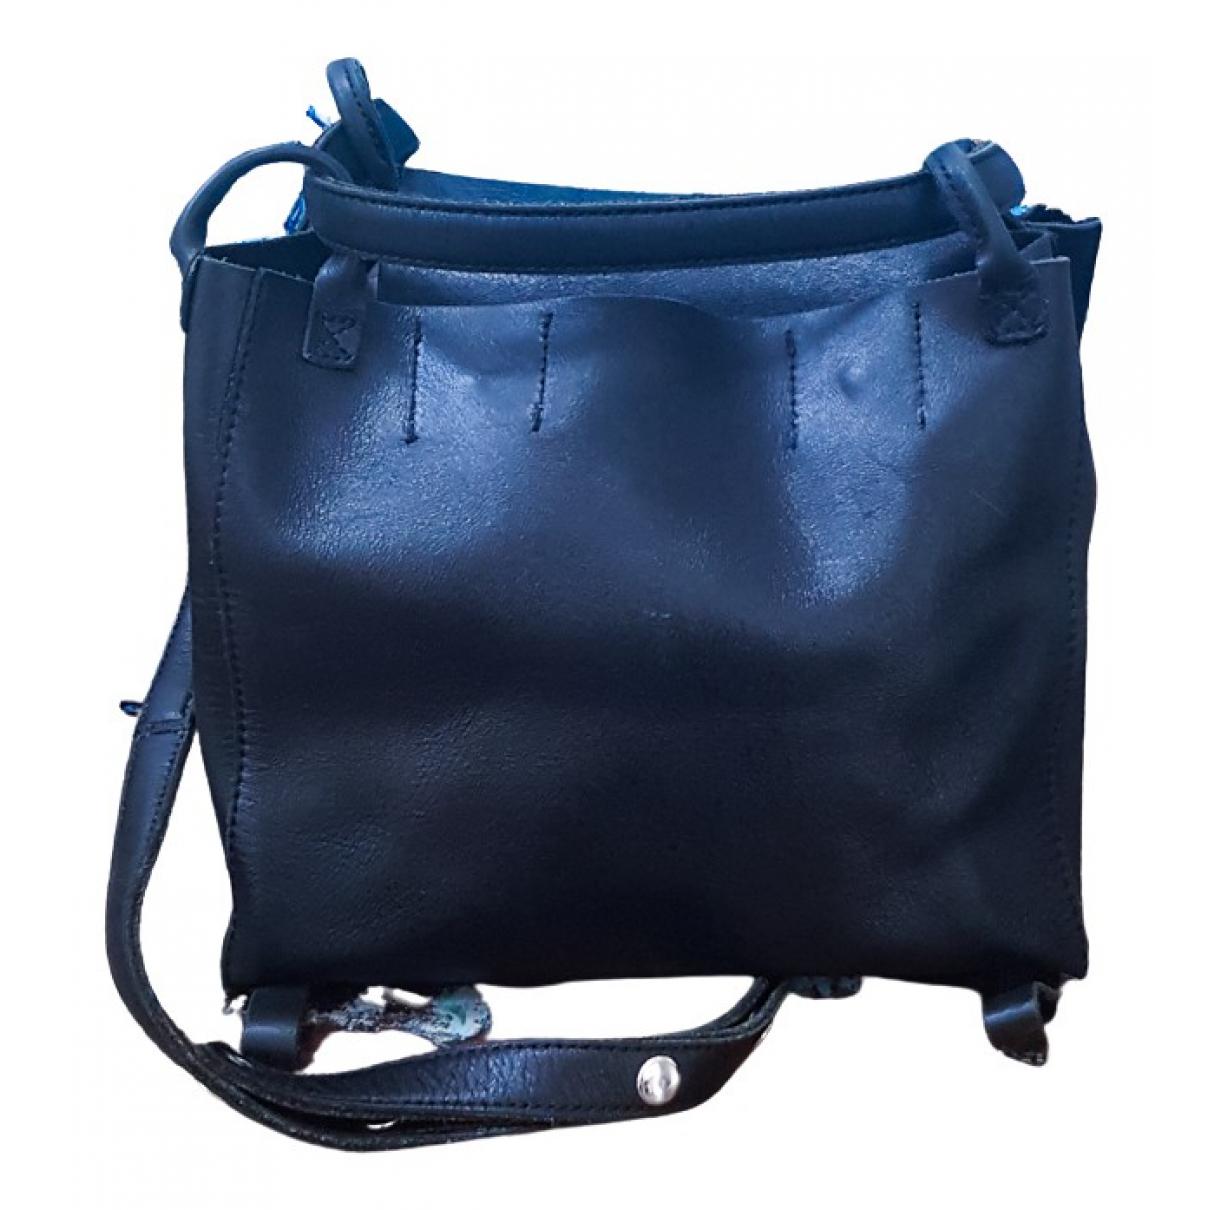 Yohji Yamamoto \N Handtasche in  Schwarz Leder